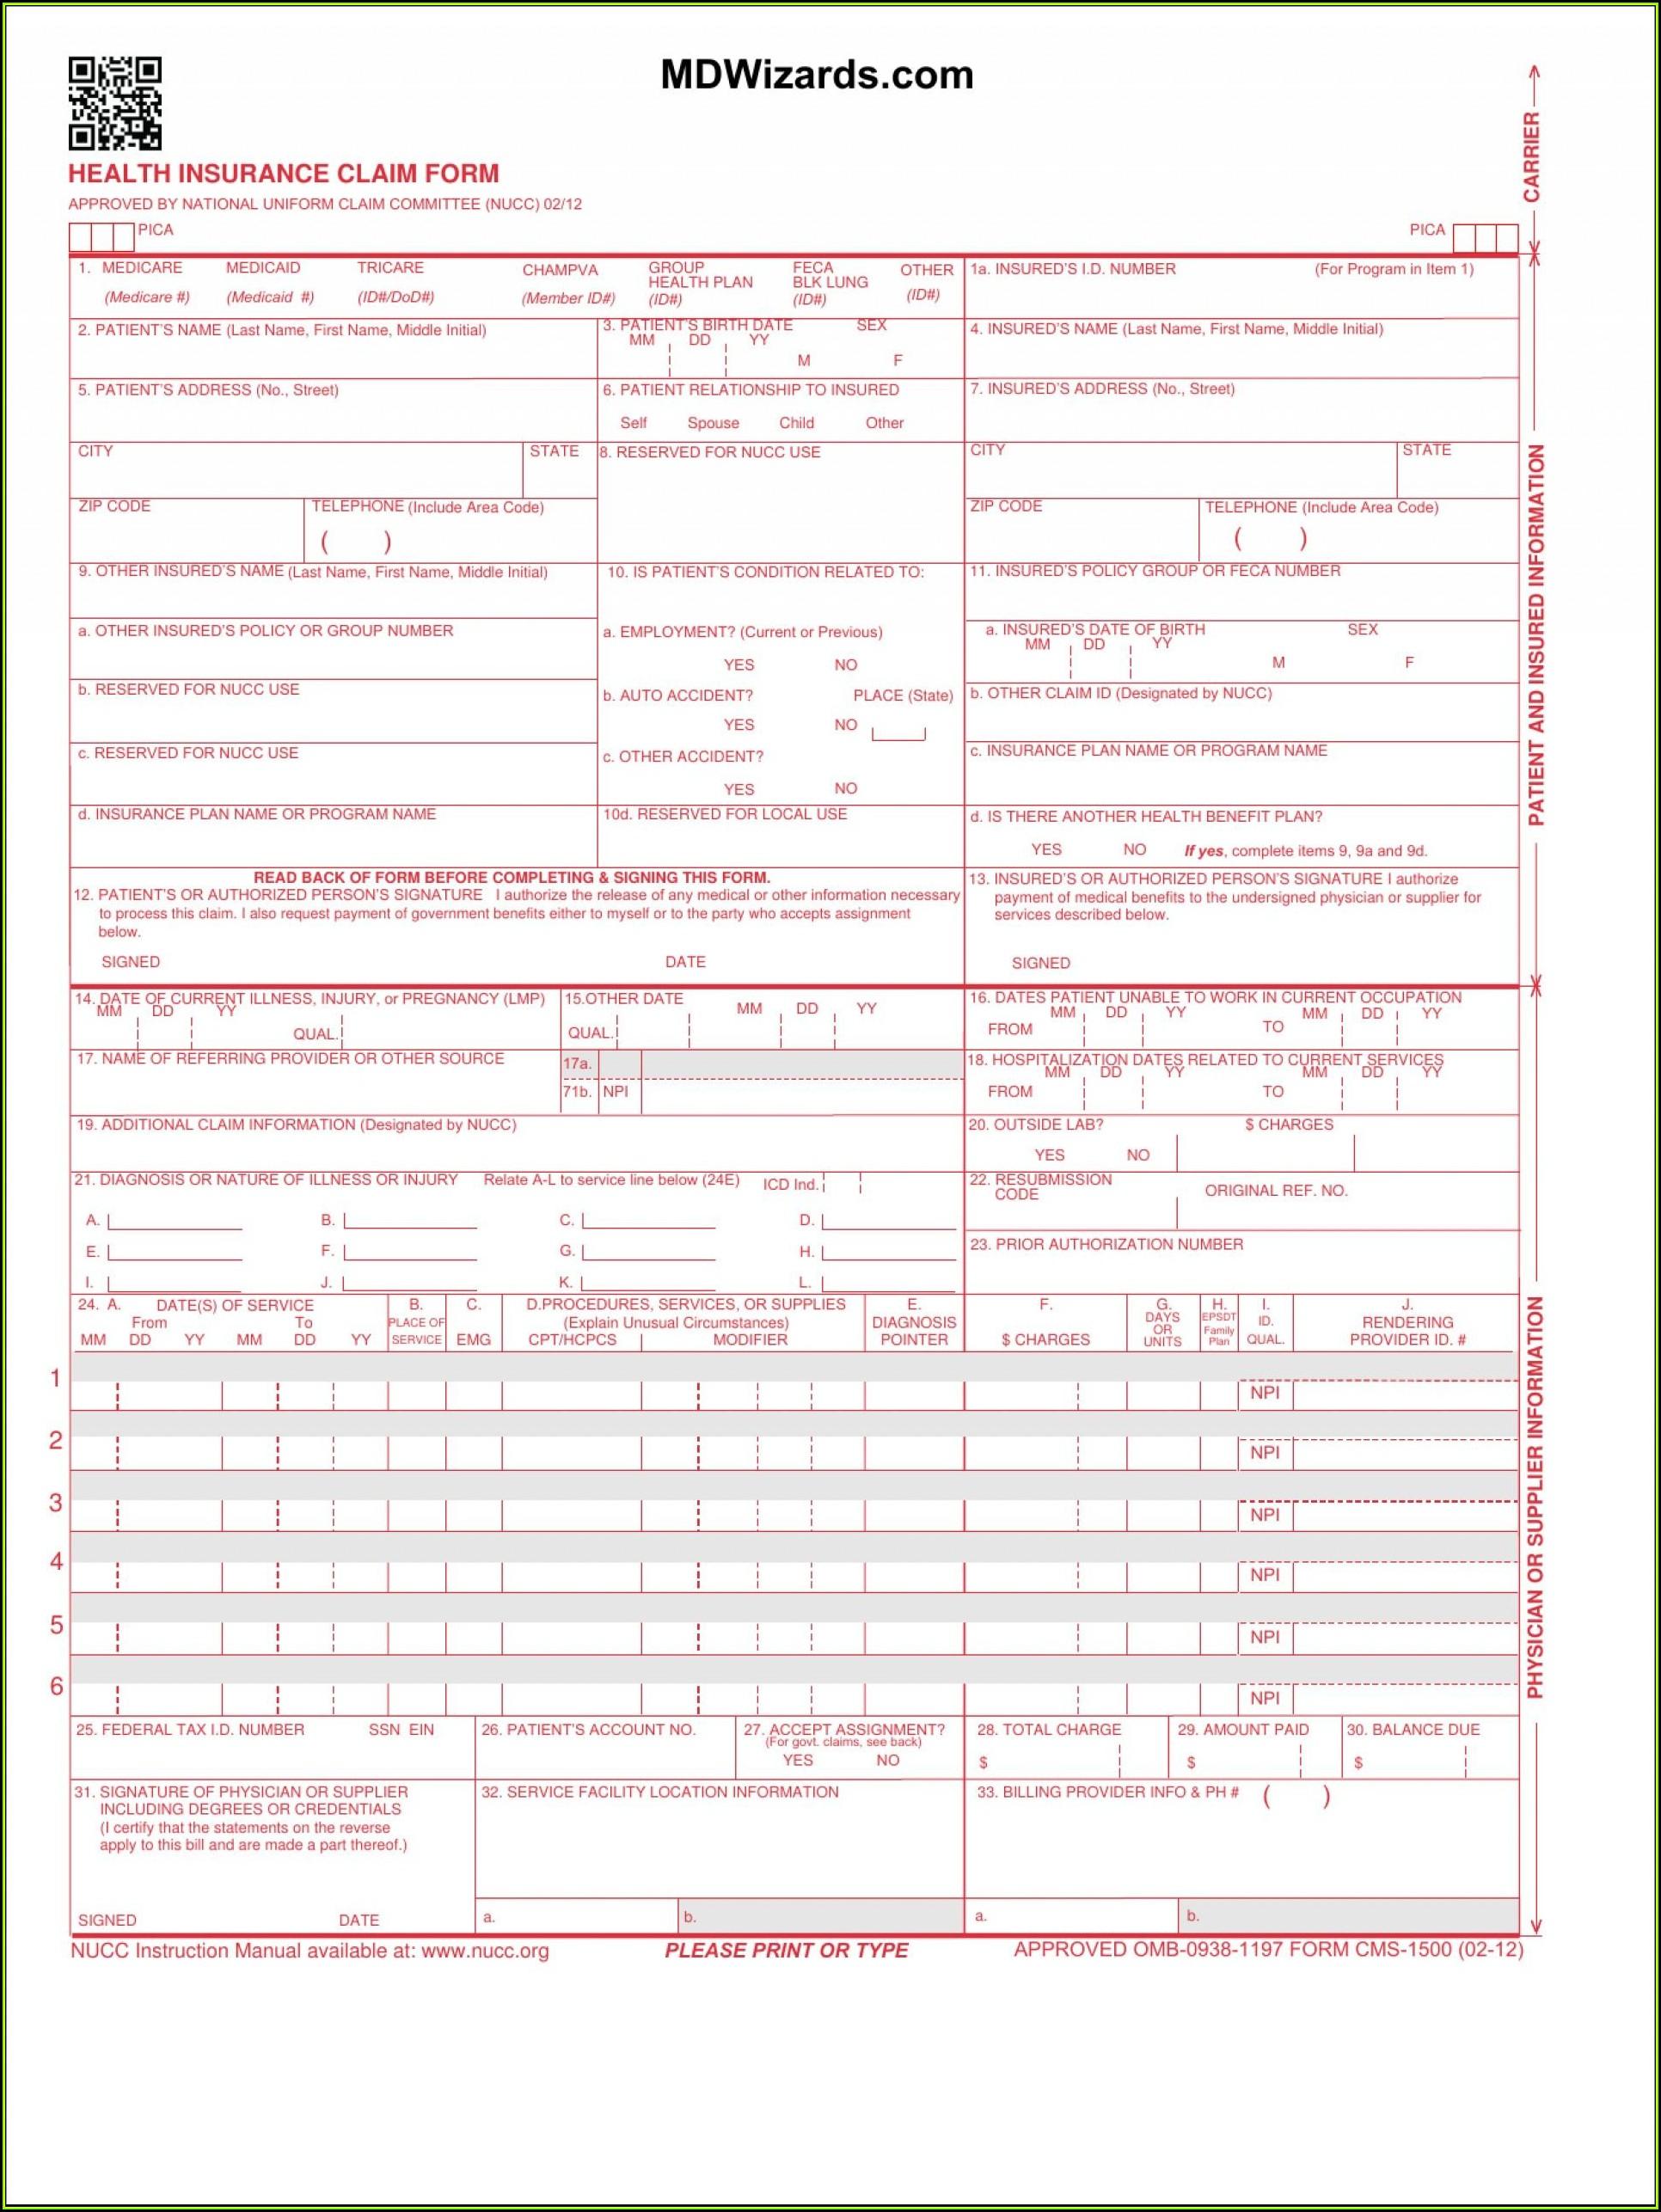 Free 1500 Form